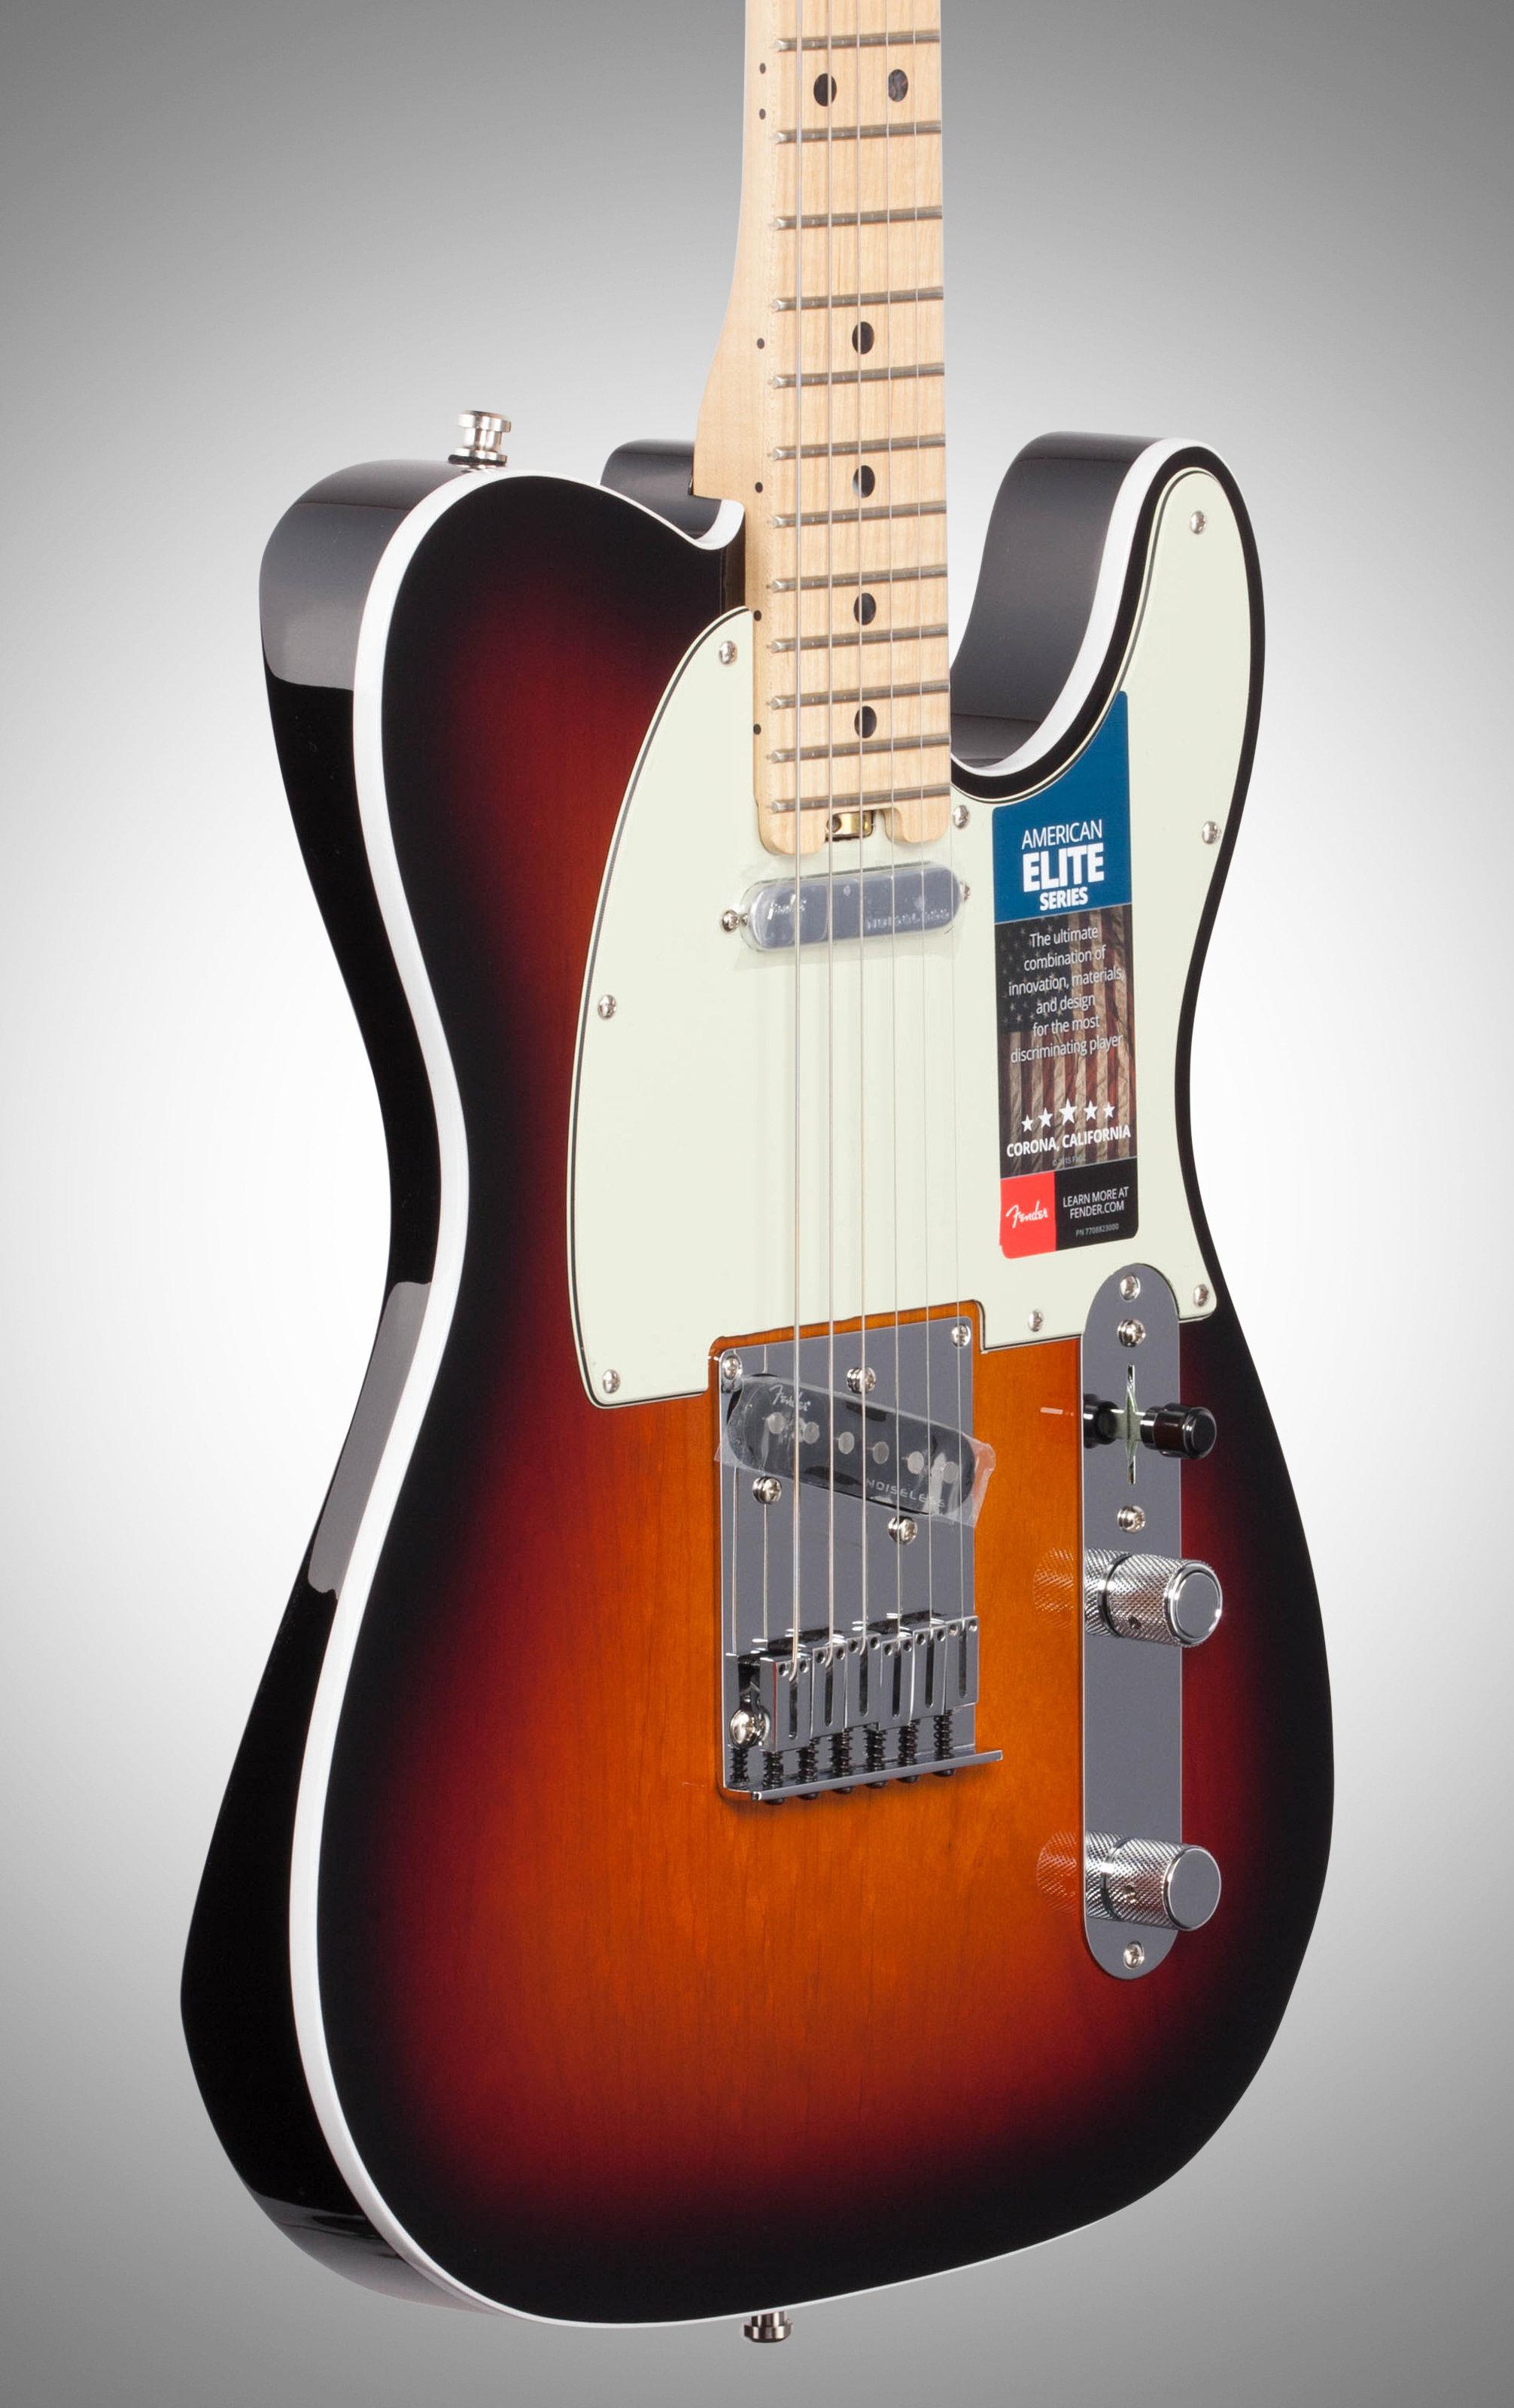 fender telecaster s1 wiring diagram well pump pressure tank american elite electric guitar maple